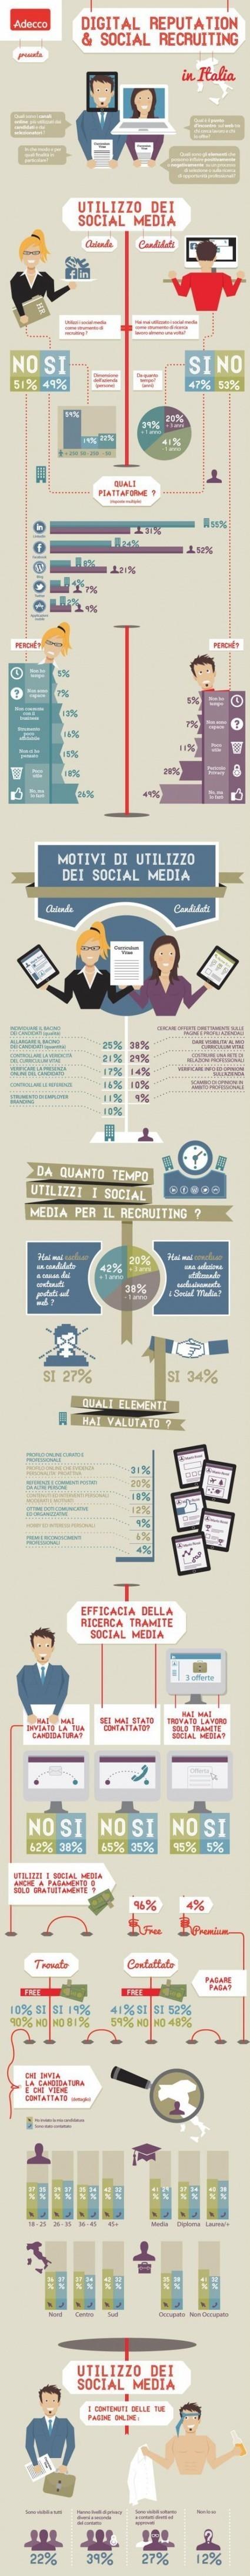 Se decolla il social recruiting | La nuvola del lavoro | Social Media (network, technology, blog, community, virtual reality, etc...) | Scoop.it